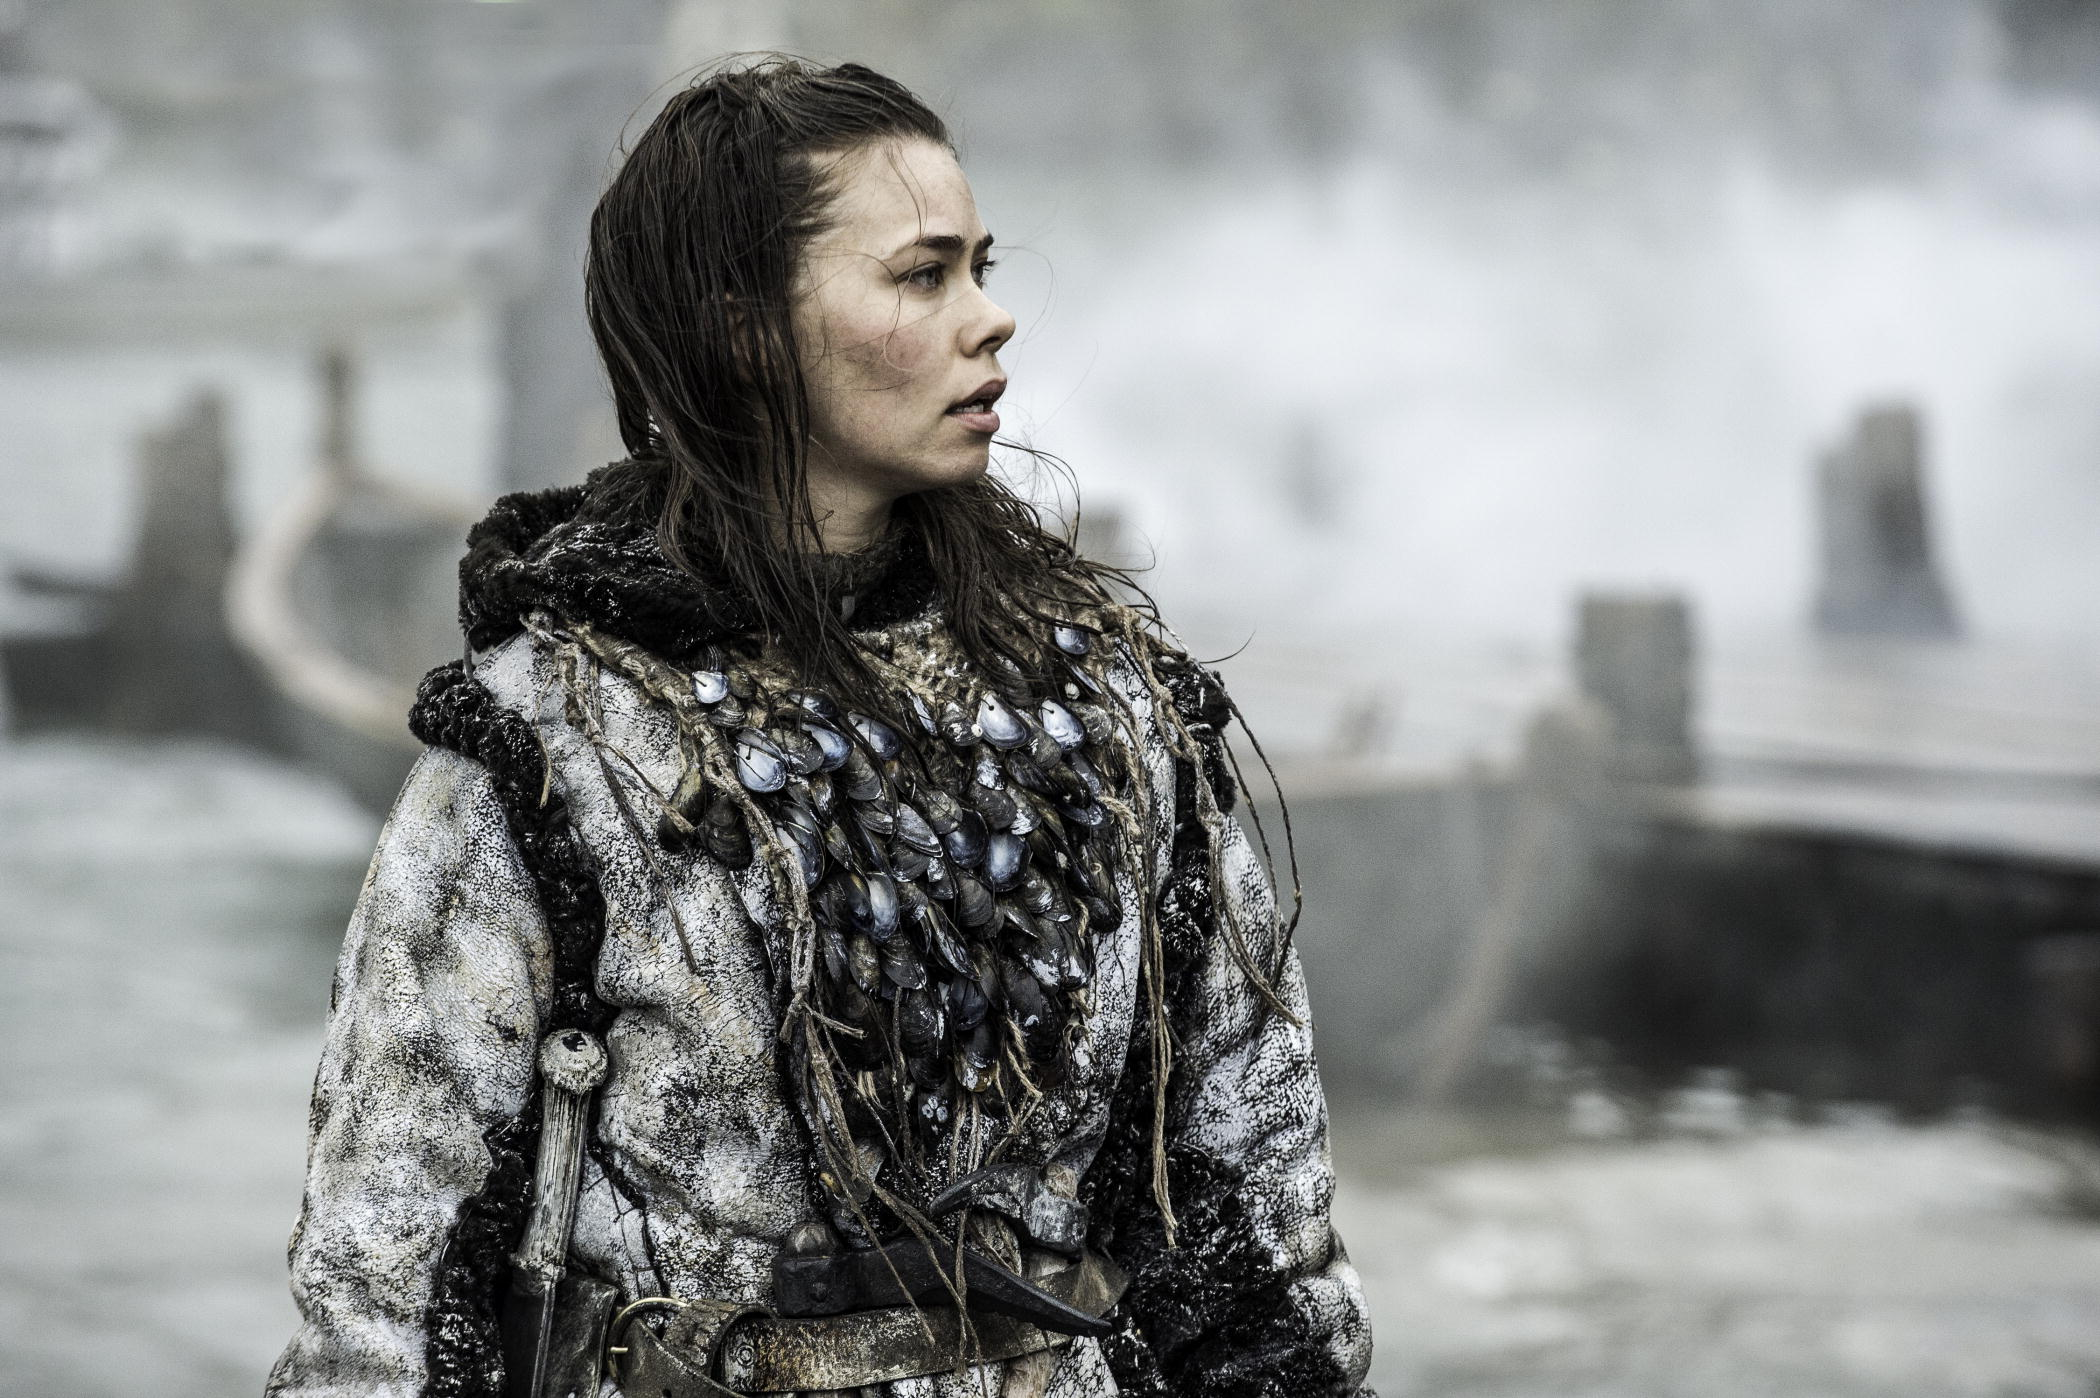 Birgitte Hjort Sørensen in Game of Thrones (2011)